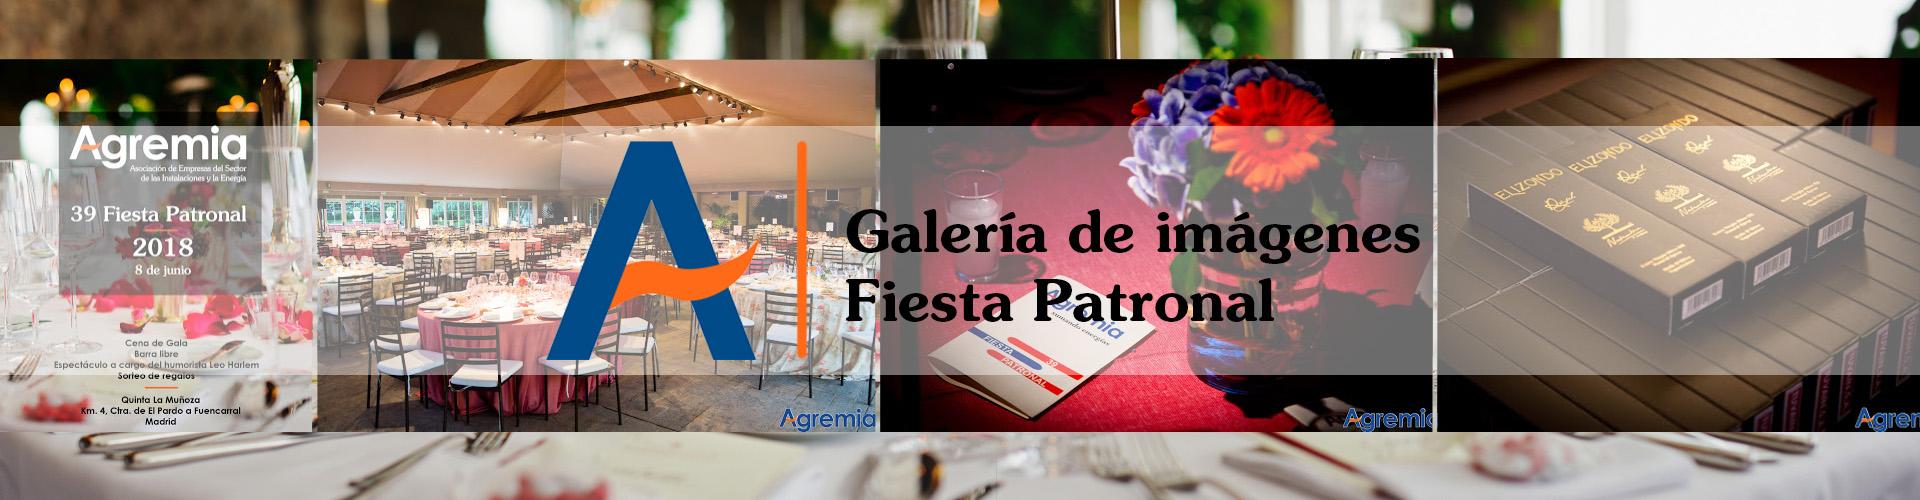 FOTOS FiestaPatronal 2018